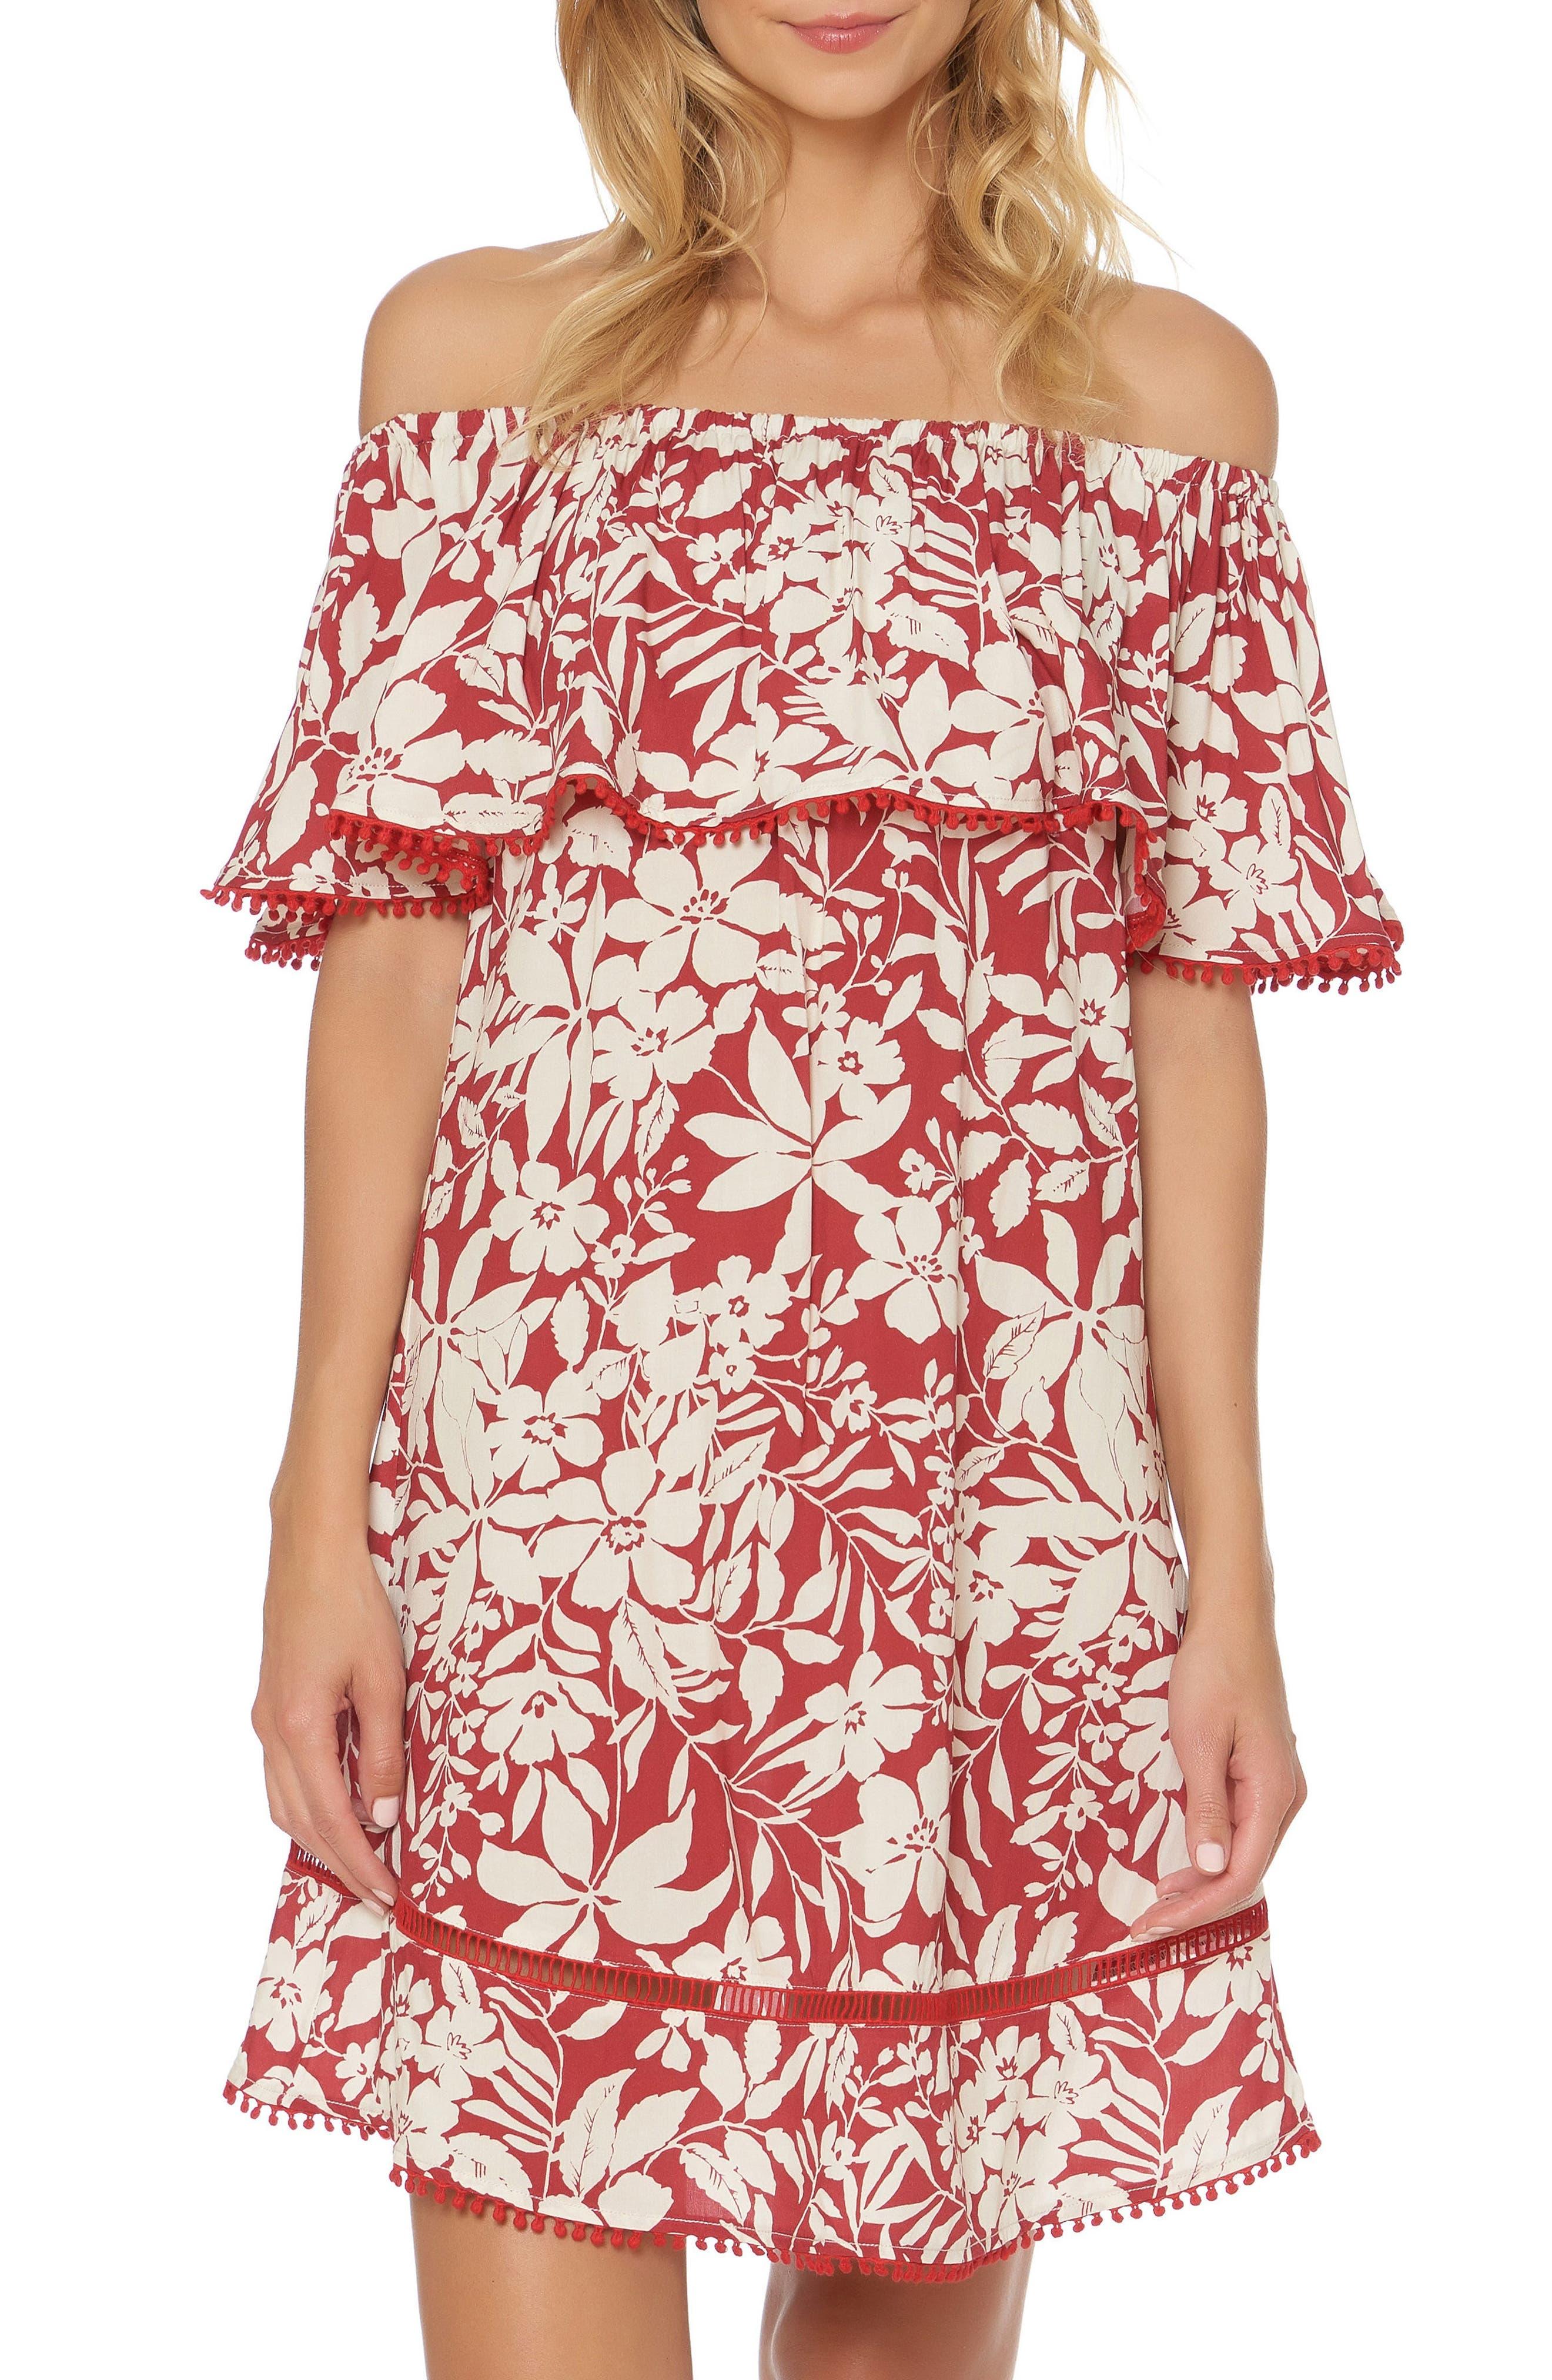 Red Carter Off the Shoulder Cover-Up Dress